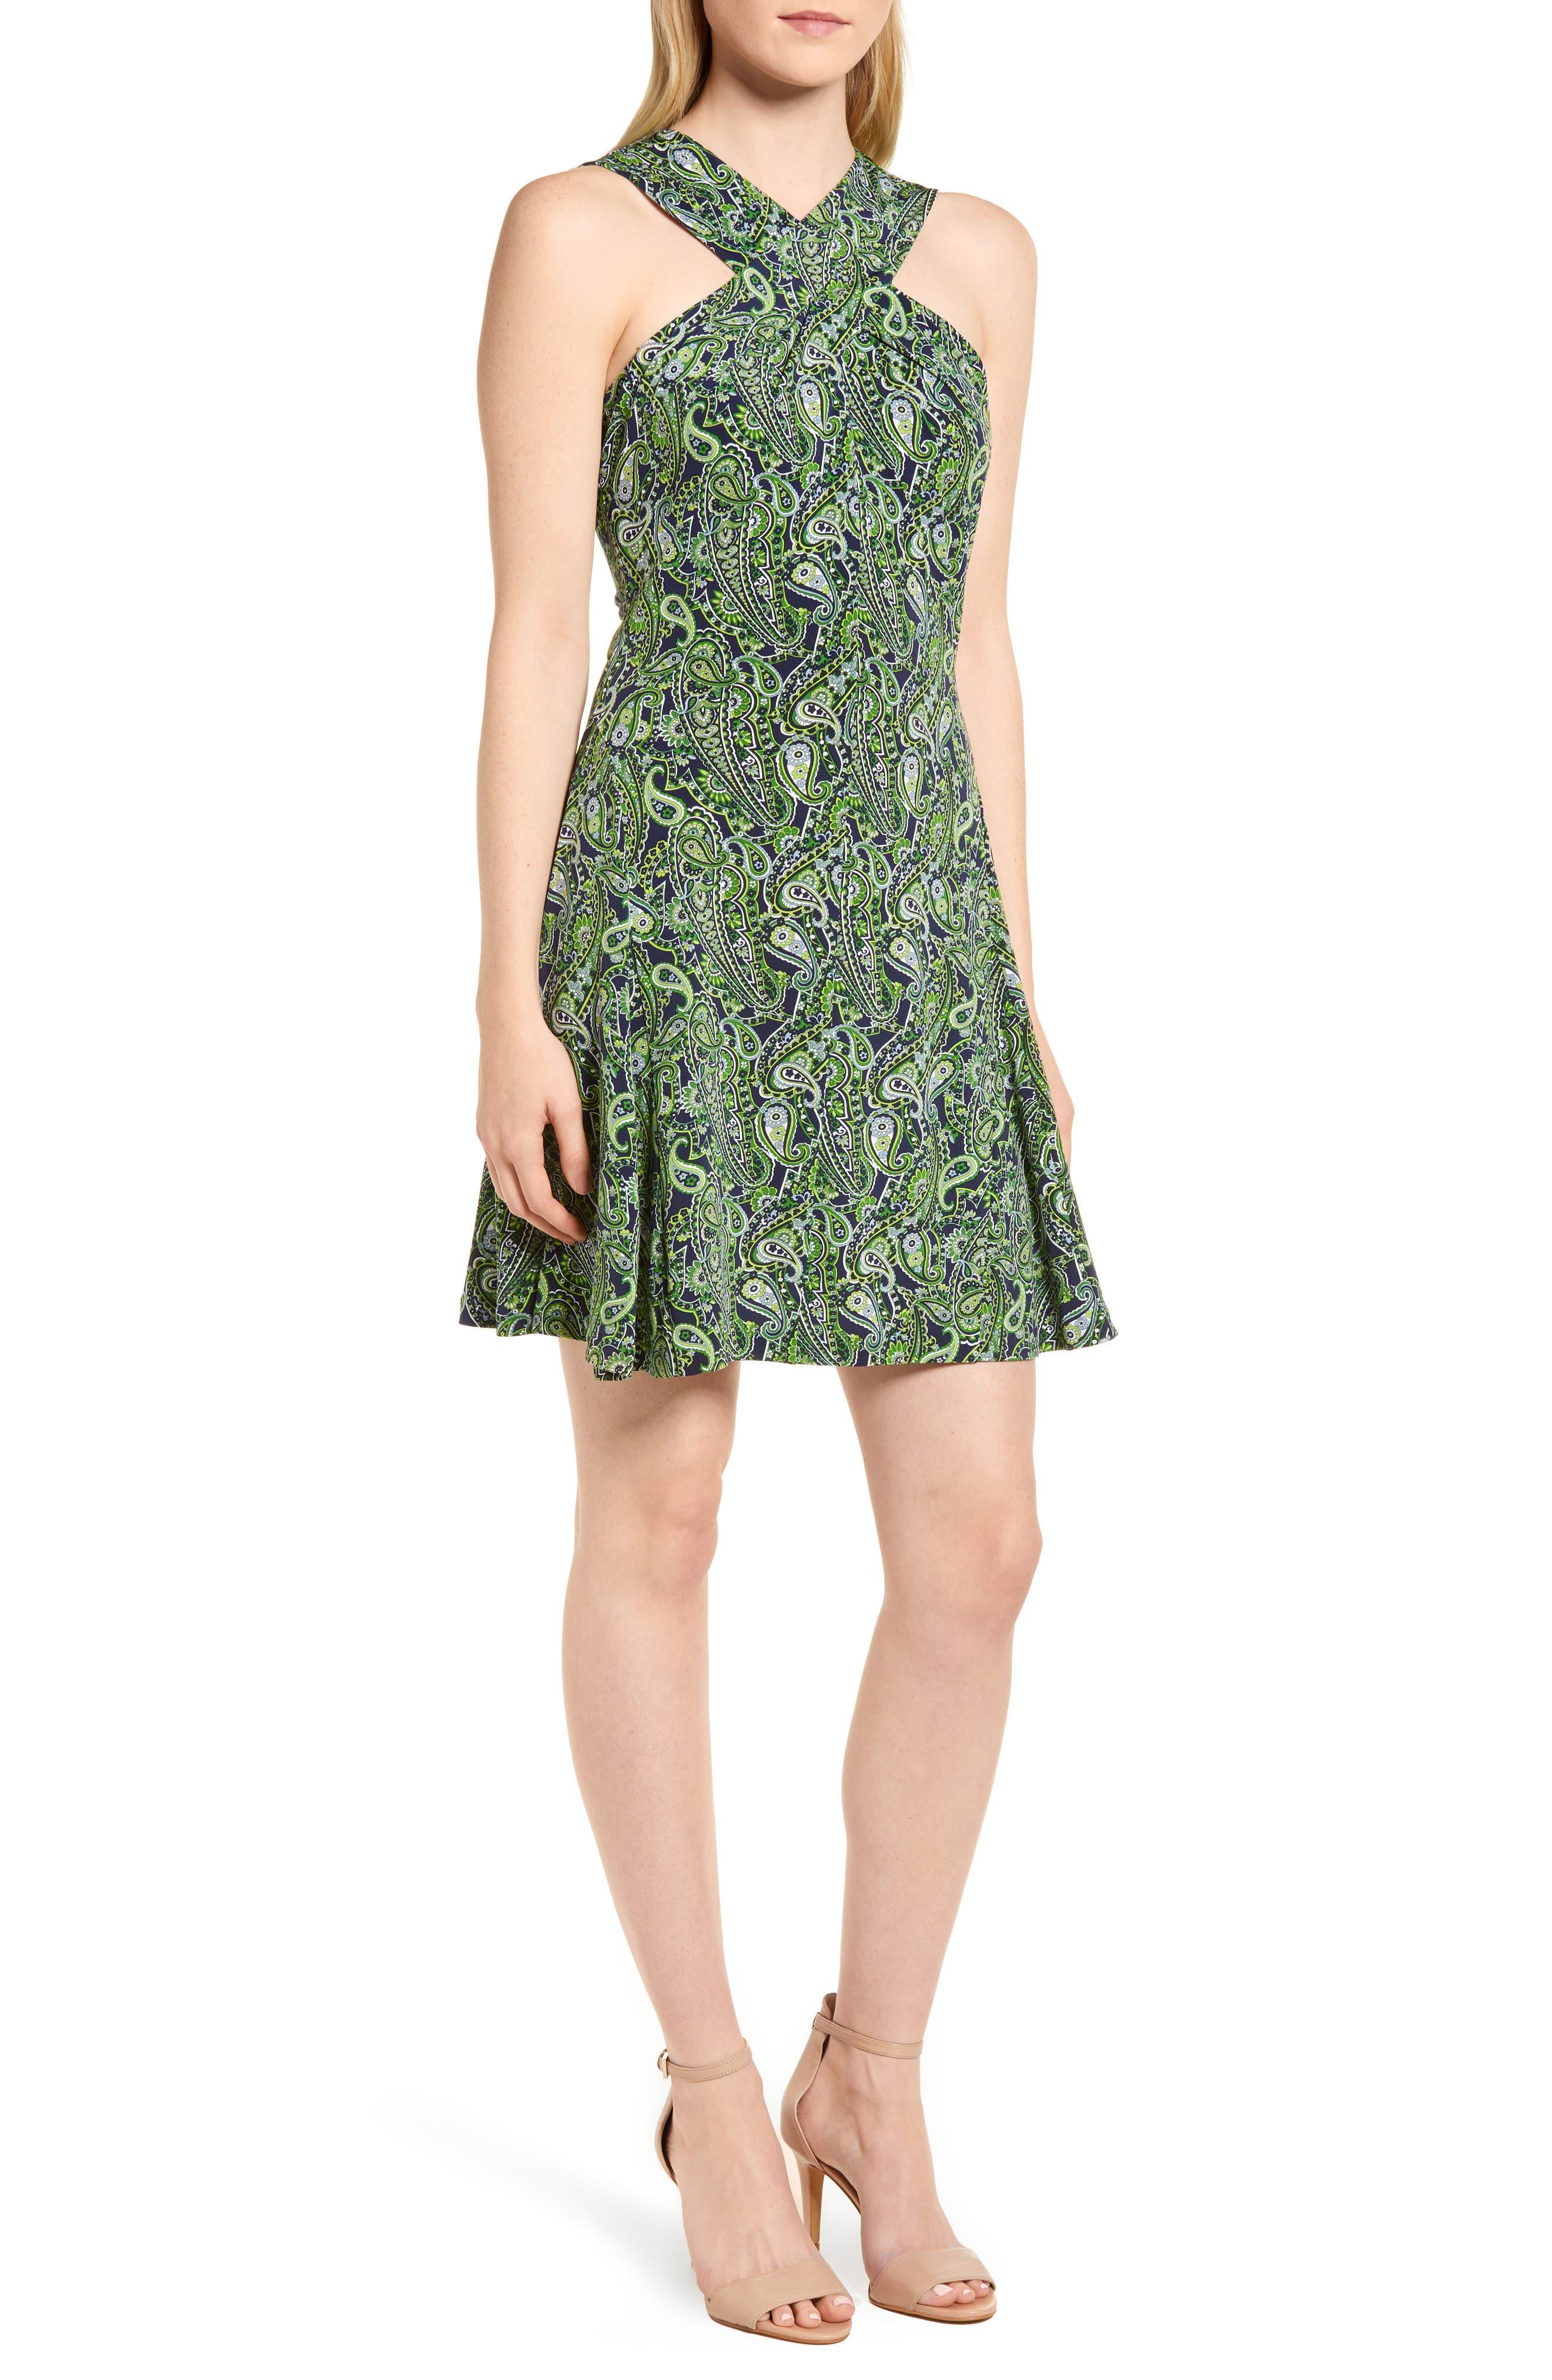 Alternate Image 1 Selected - MICHAEL Michael Kors Paisley Paradise Fit & Flare Dress